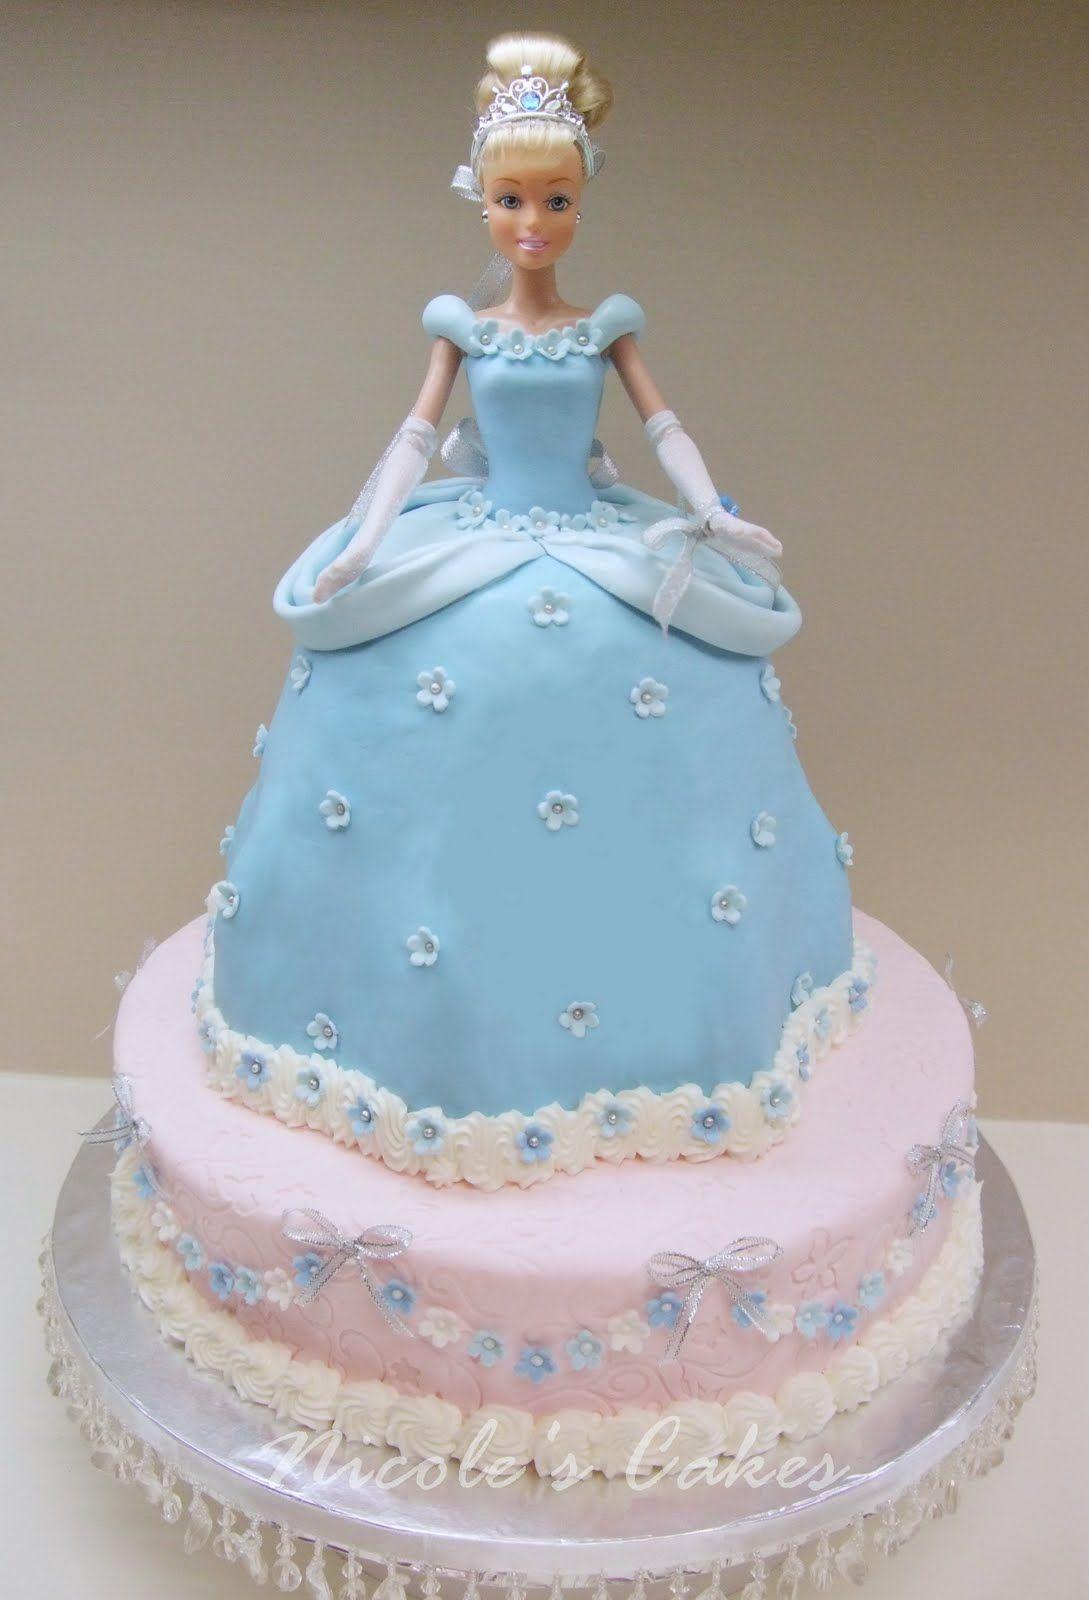 Confections Cakes Amp Creations Princess Cinderella